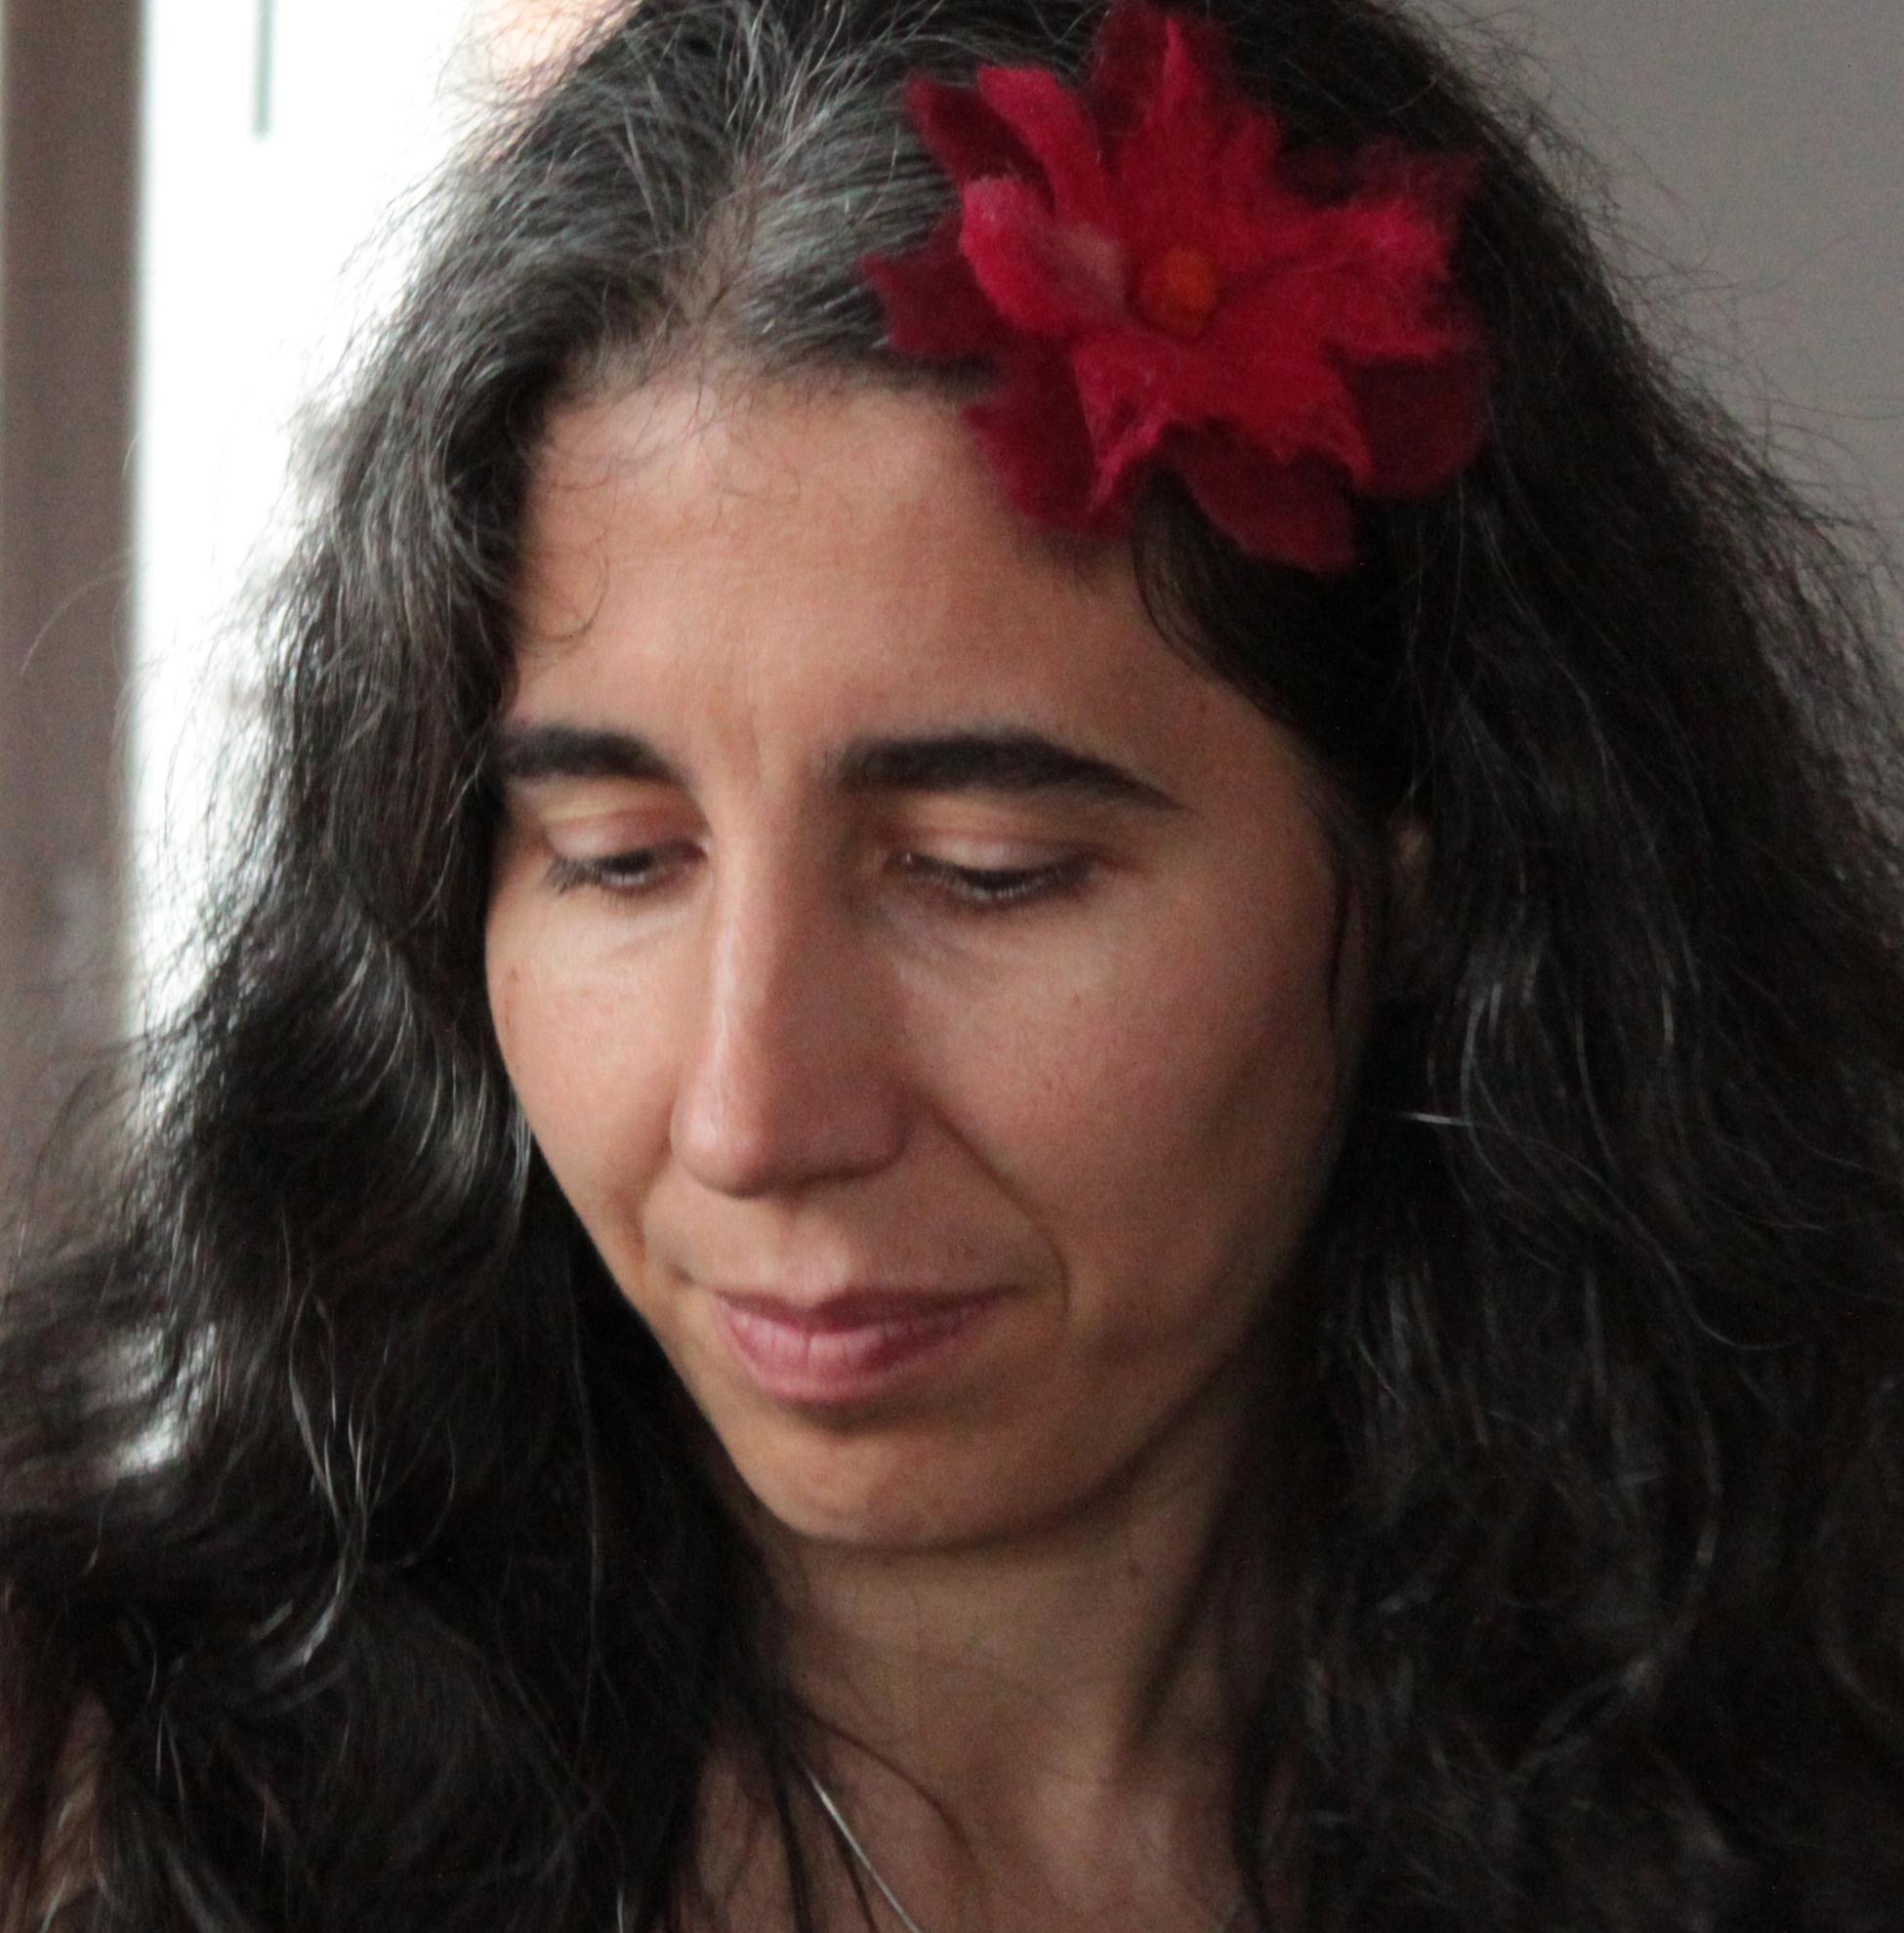 Molnár Jacqueline